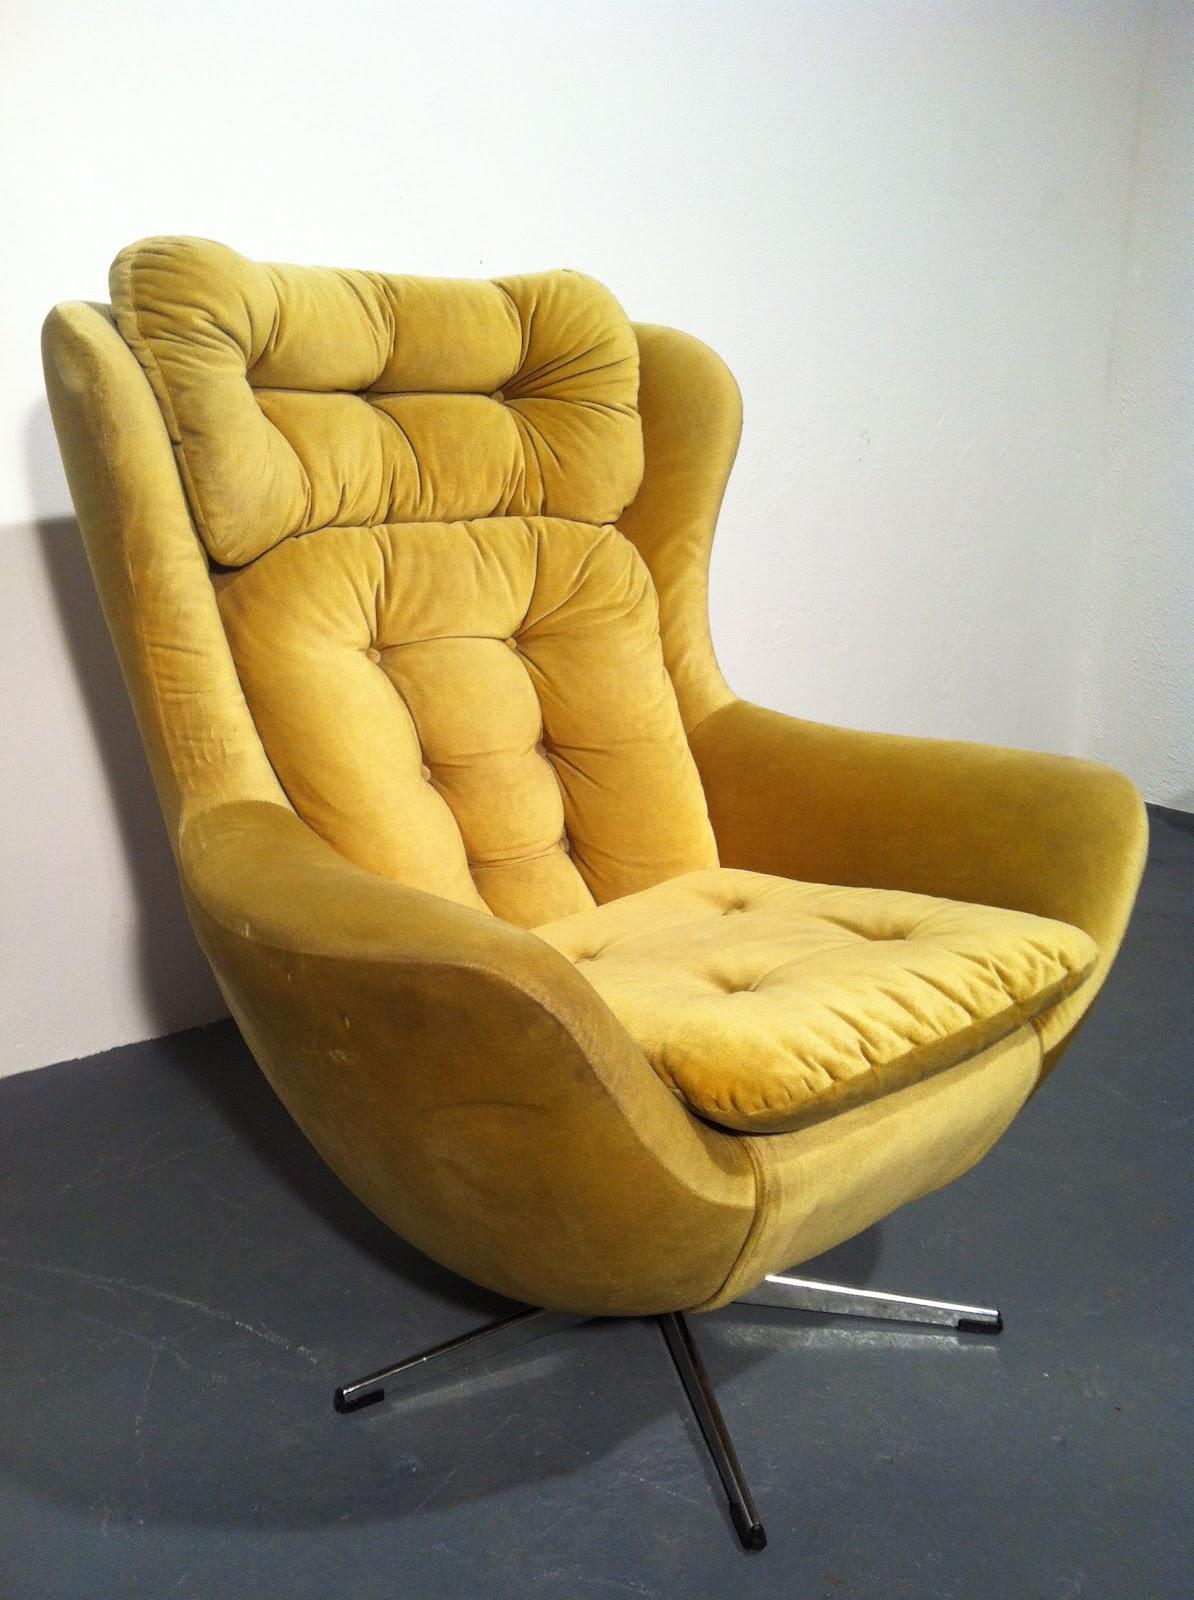 Vintage Furniture Ireland Ocd June 2012